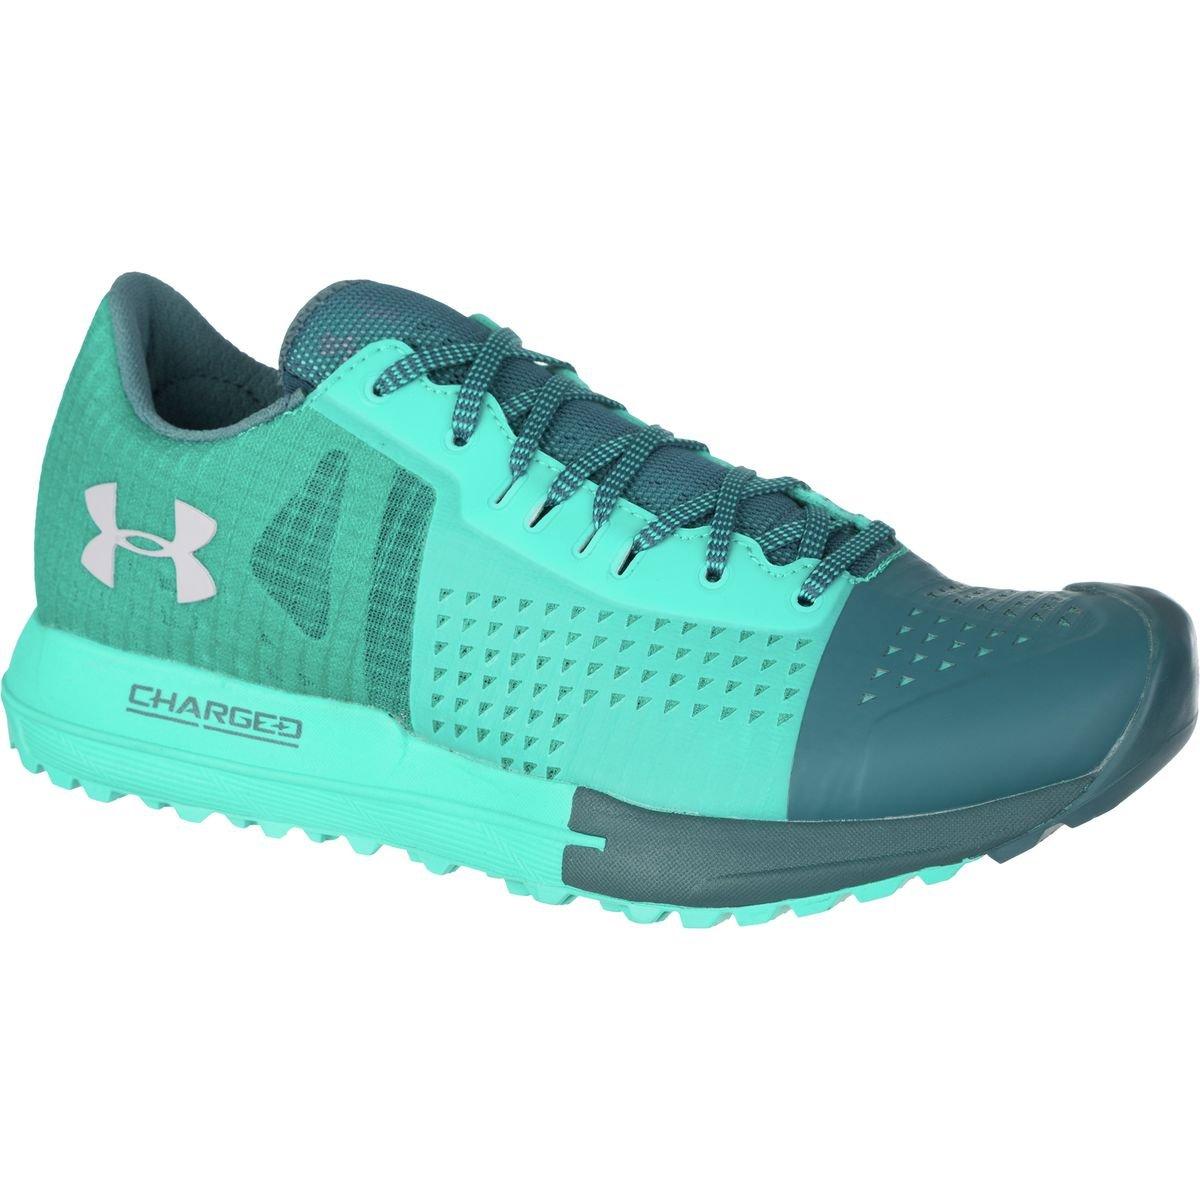 Under Armour Women's Horizon Ktv B(M) Hiking Boot B01GPEJIJS 6 B(M) Ktv US|Neptune/Marlin Blue/Lavender Ice bd4806